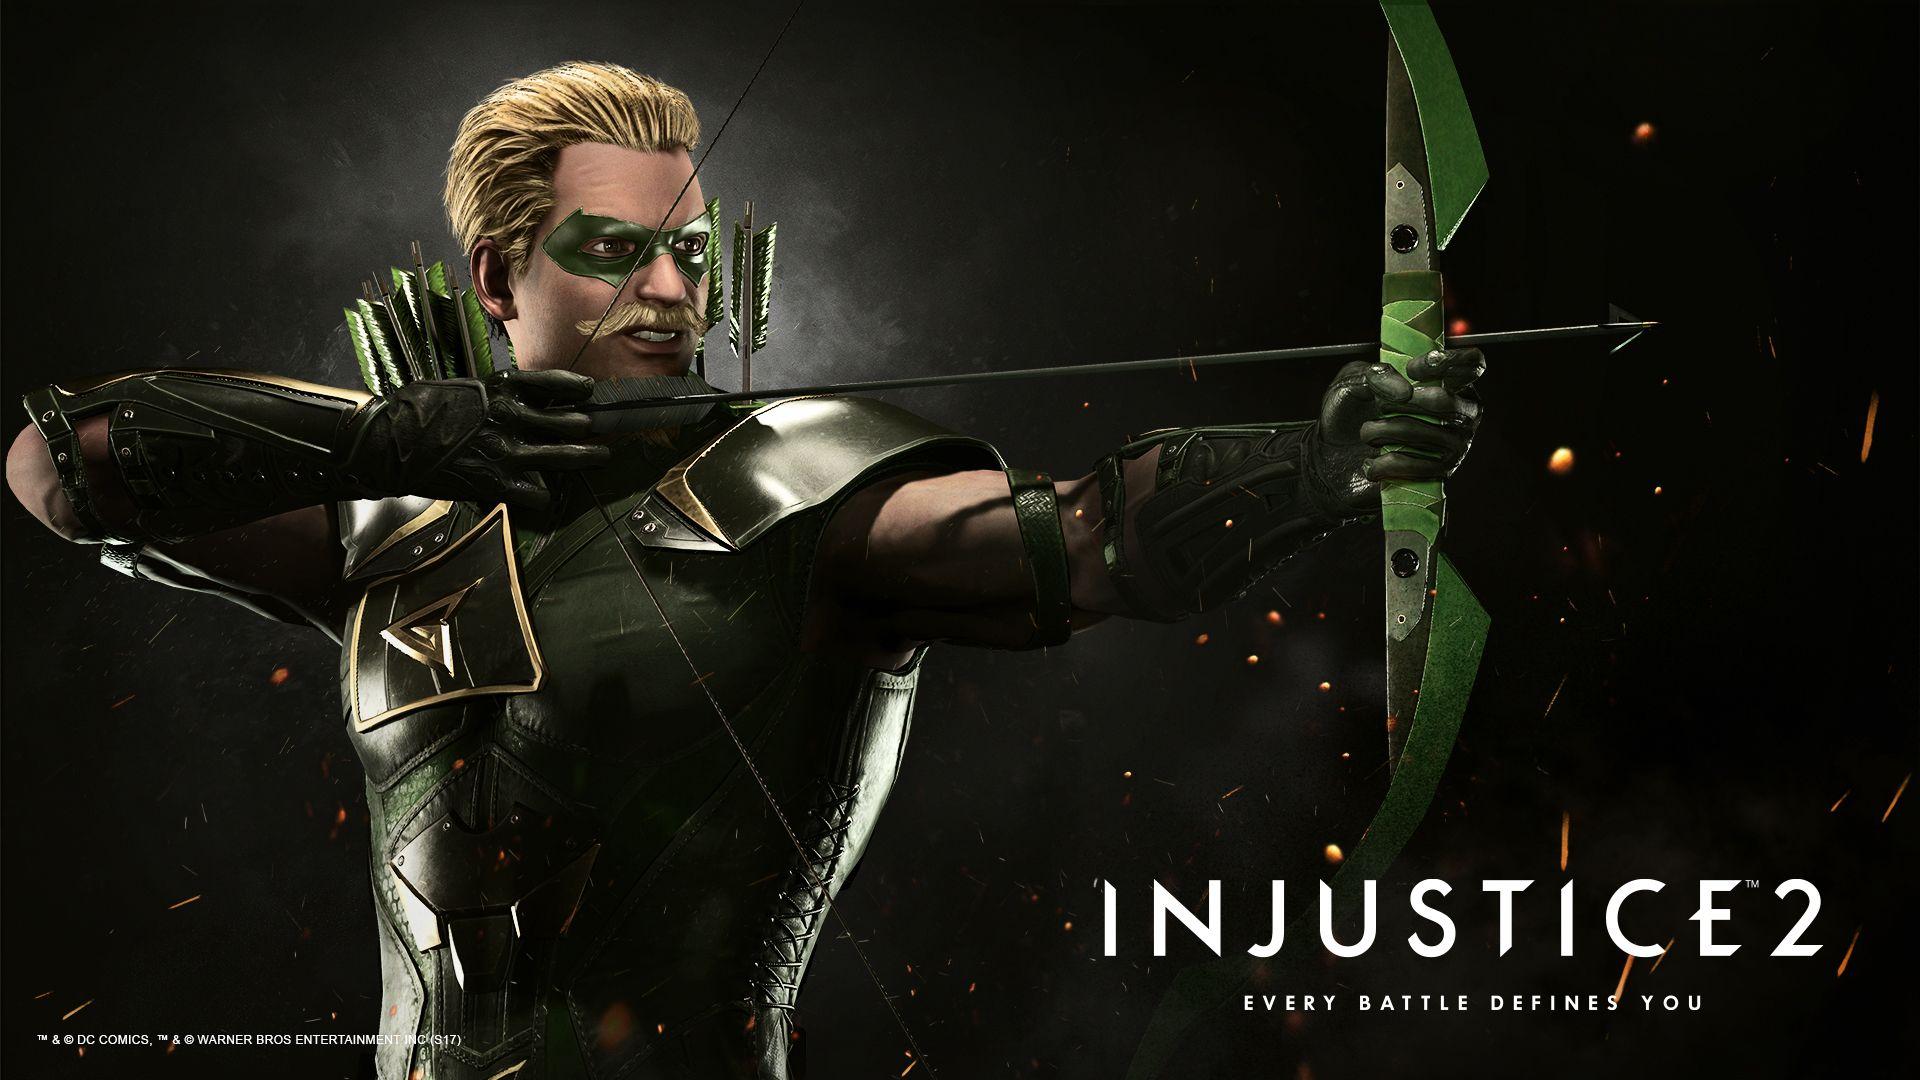 image - injustice2-green-arrow-wallpaper-1920x1080-26